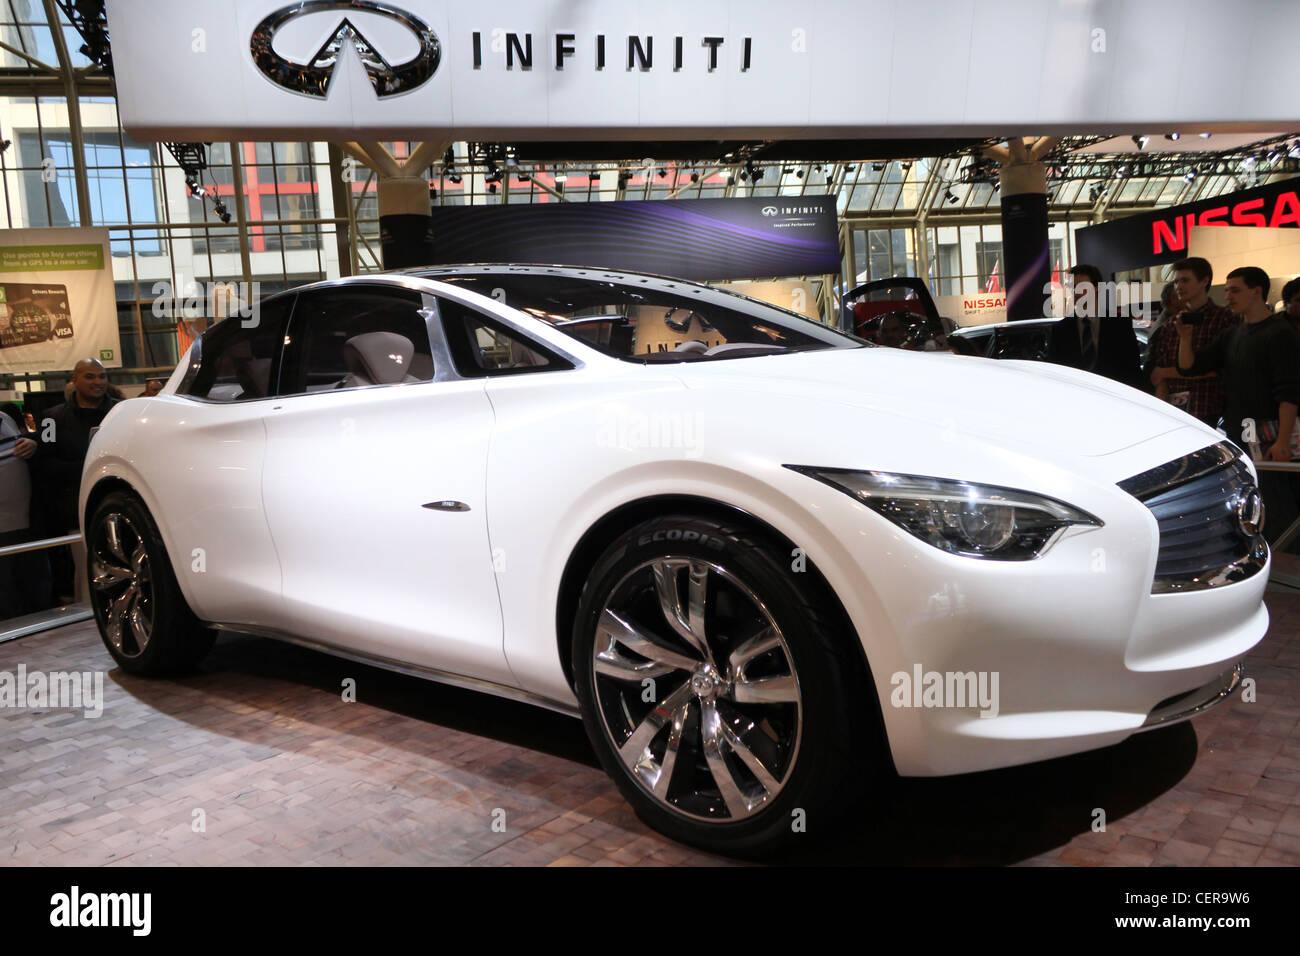 Concept Electric Car Infiniti Etherea Stock Photo 43538578 Alamy